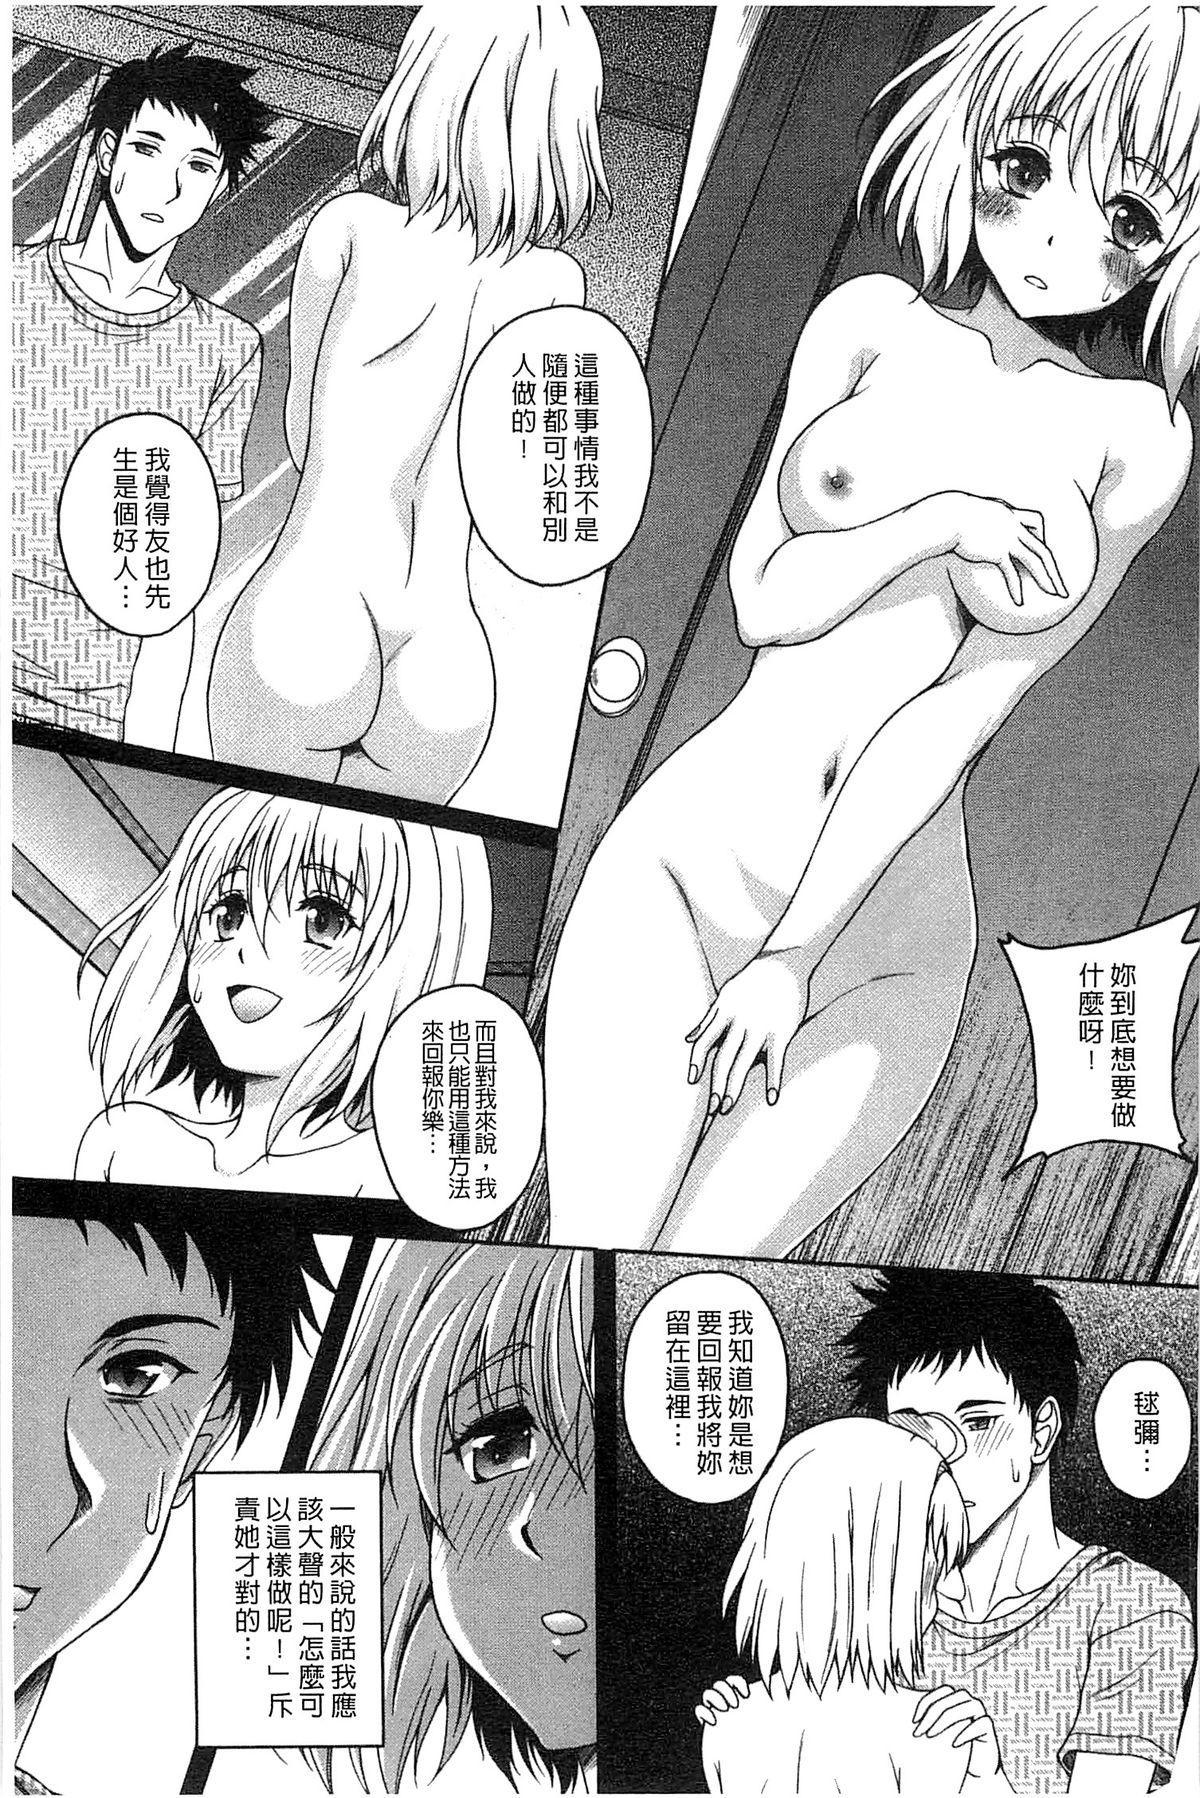 Hajimete nan dakara - First sexual experience 189